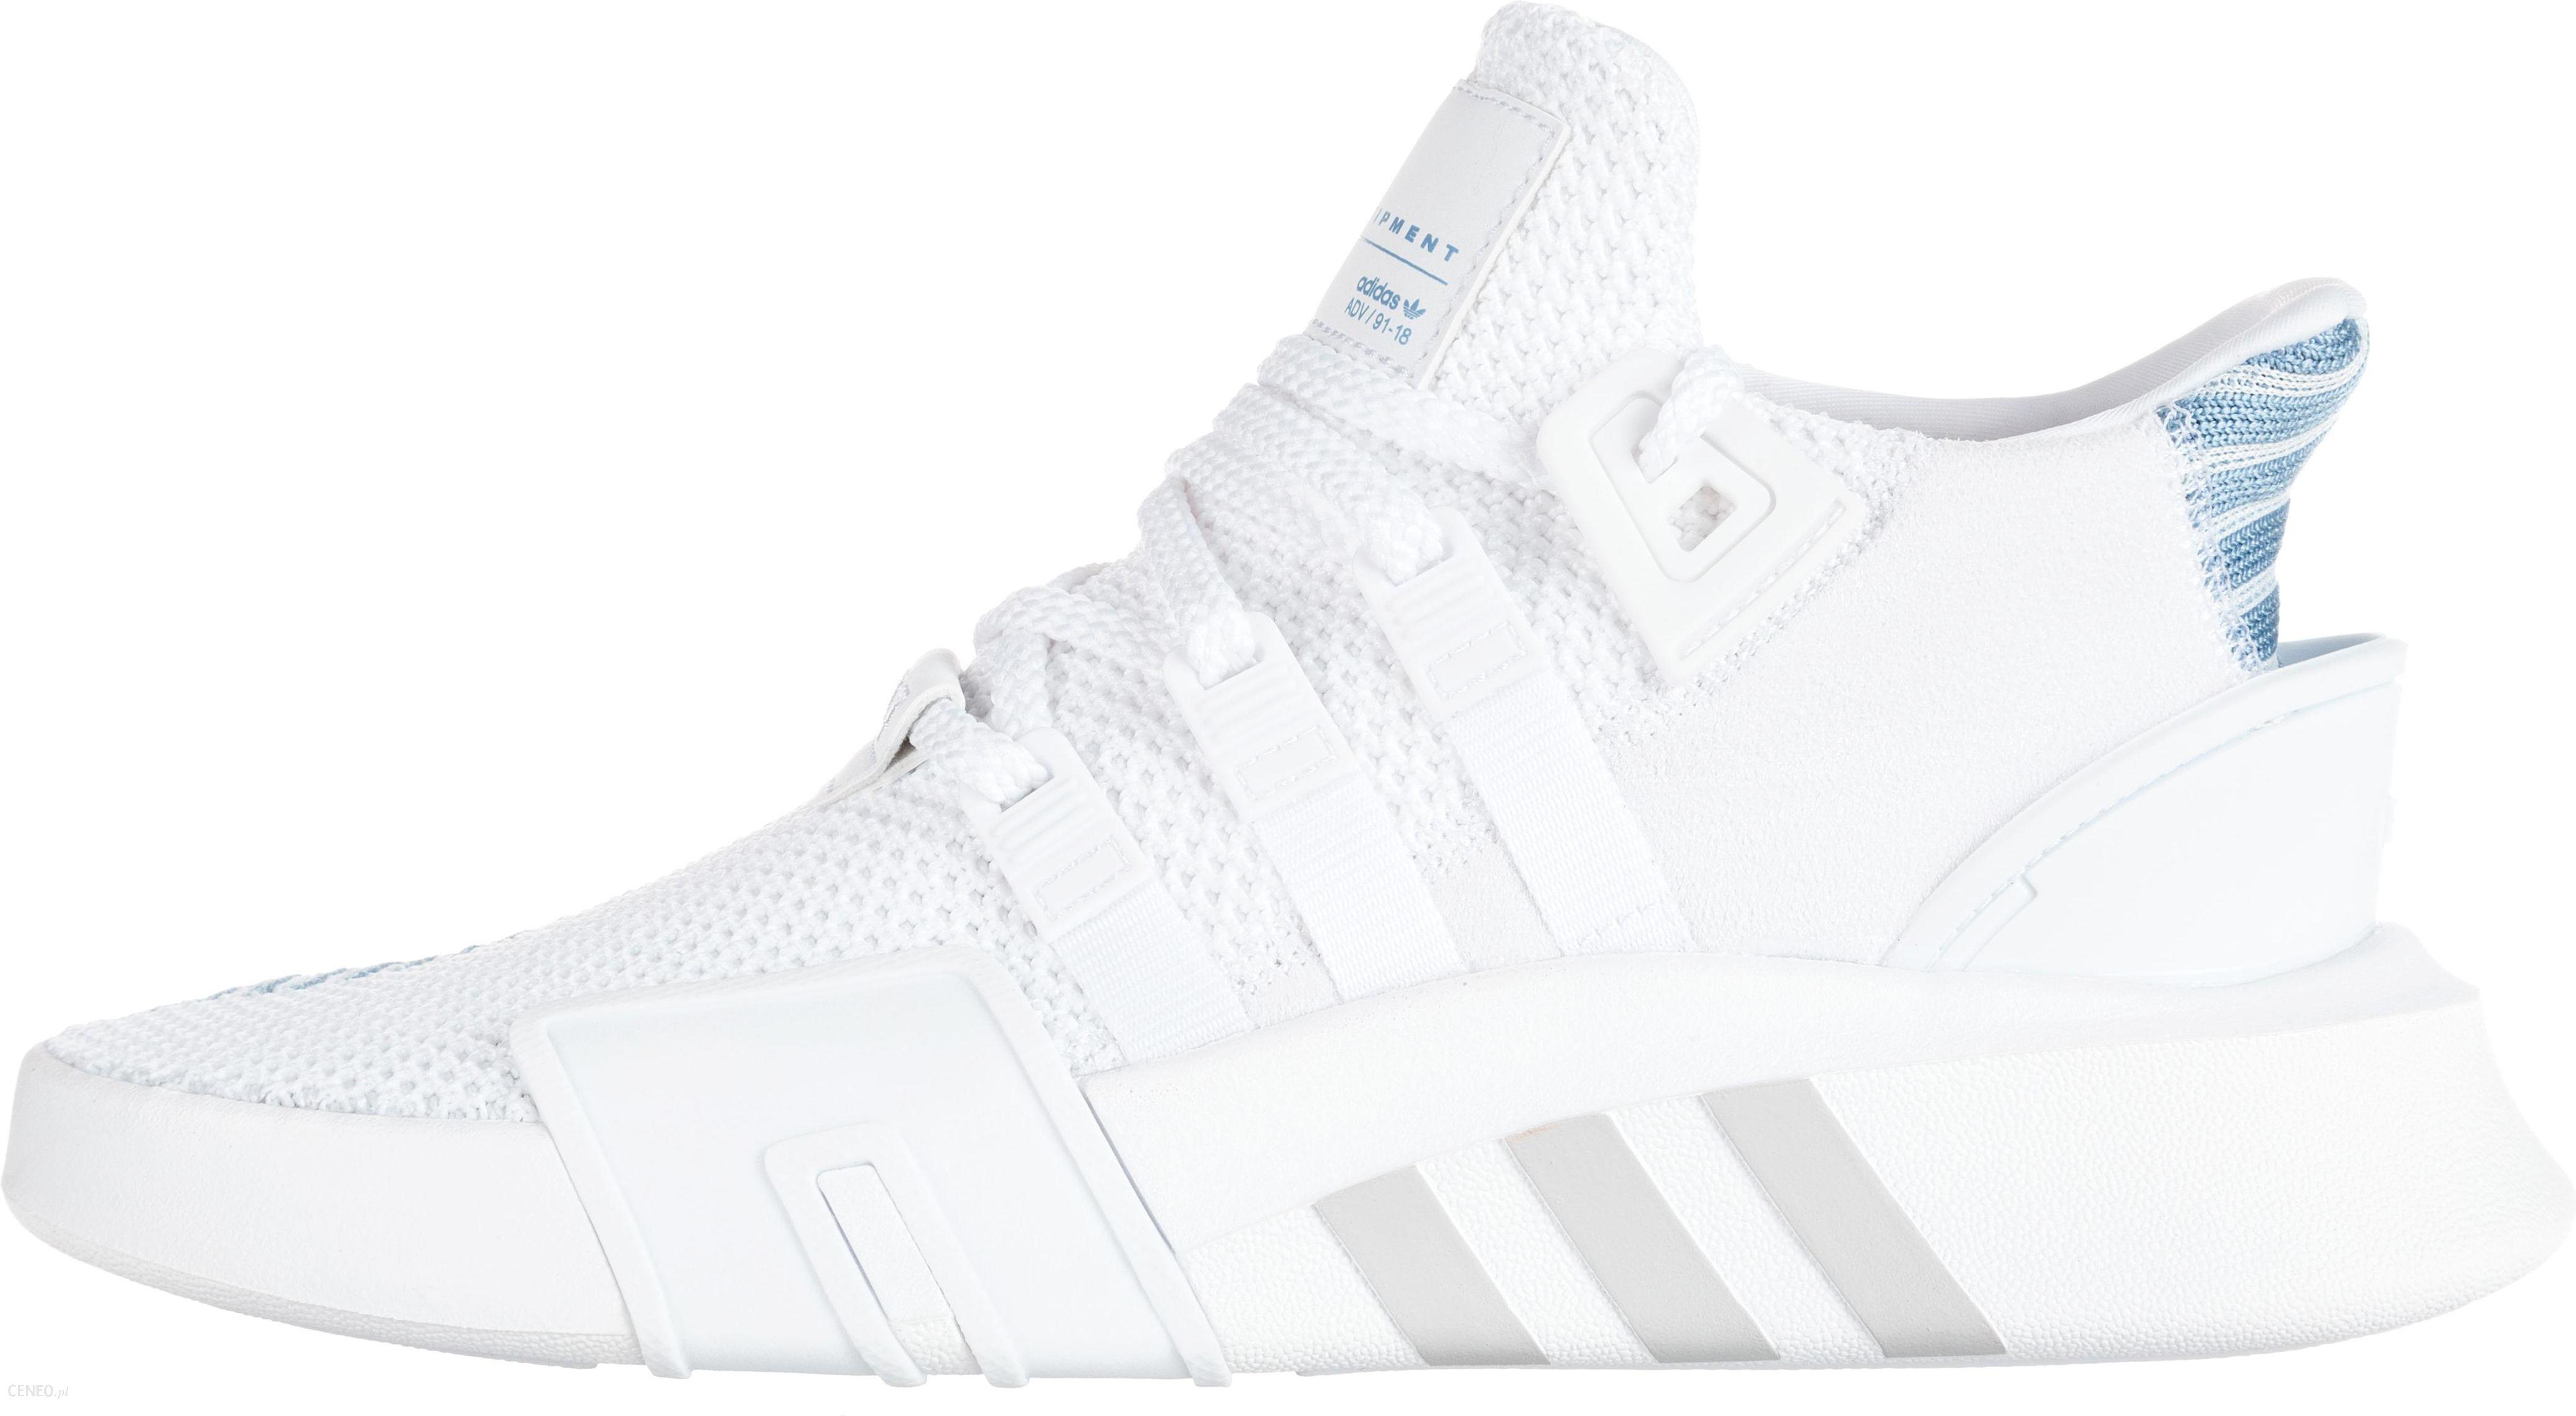 competitive price e3695 be813 adidas eqt originals biale adidas originals Damskie Sneakers Eqt Support Adv  ...